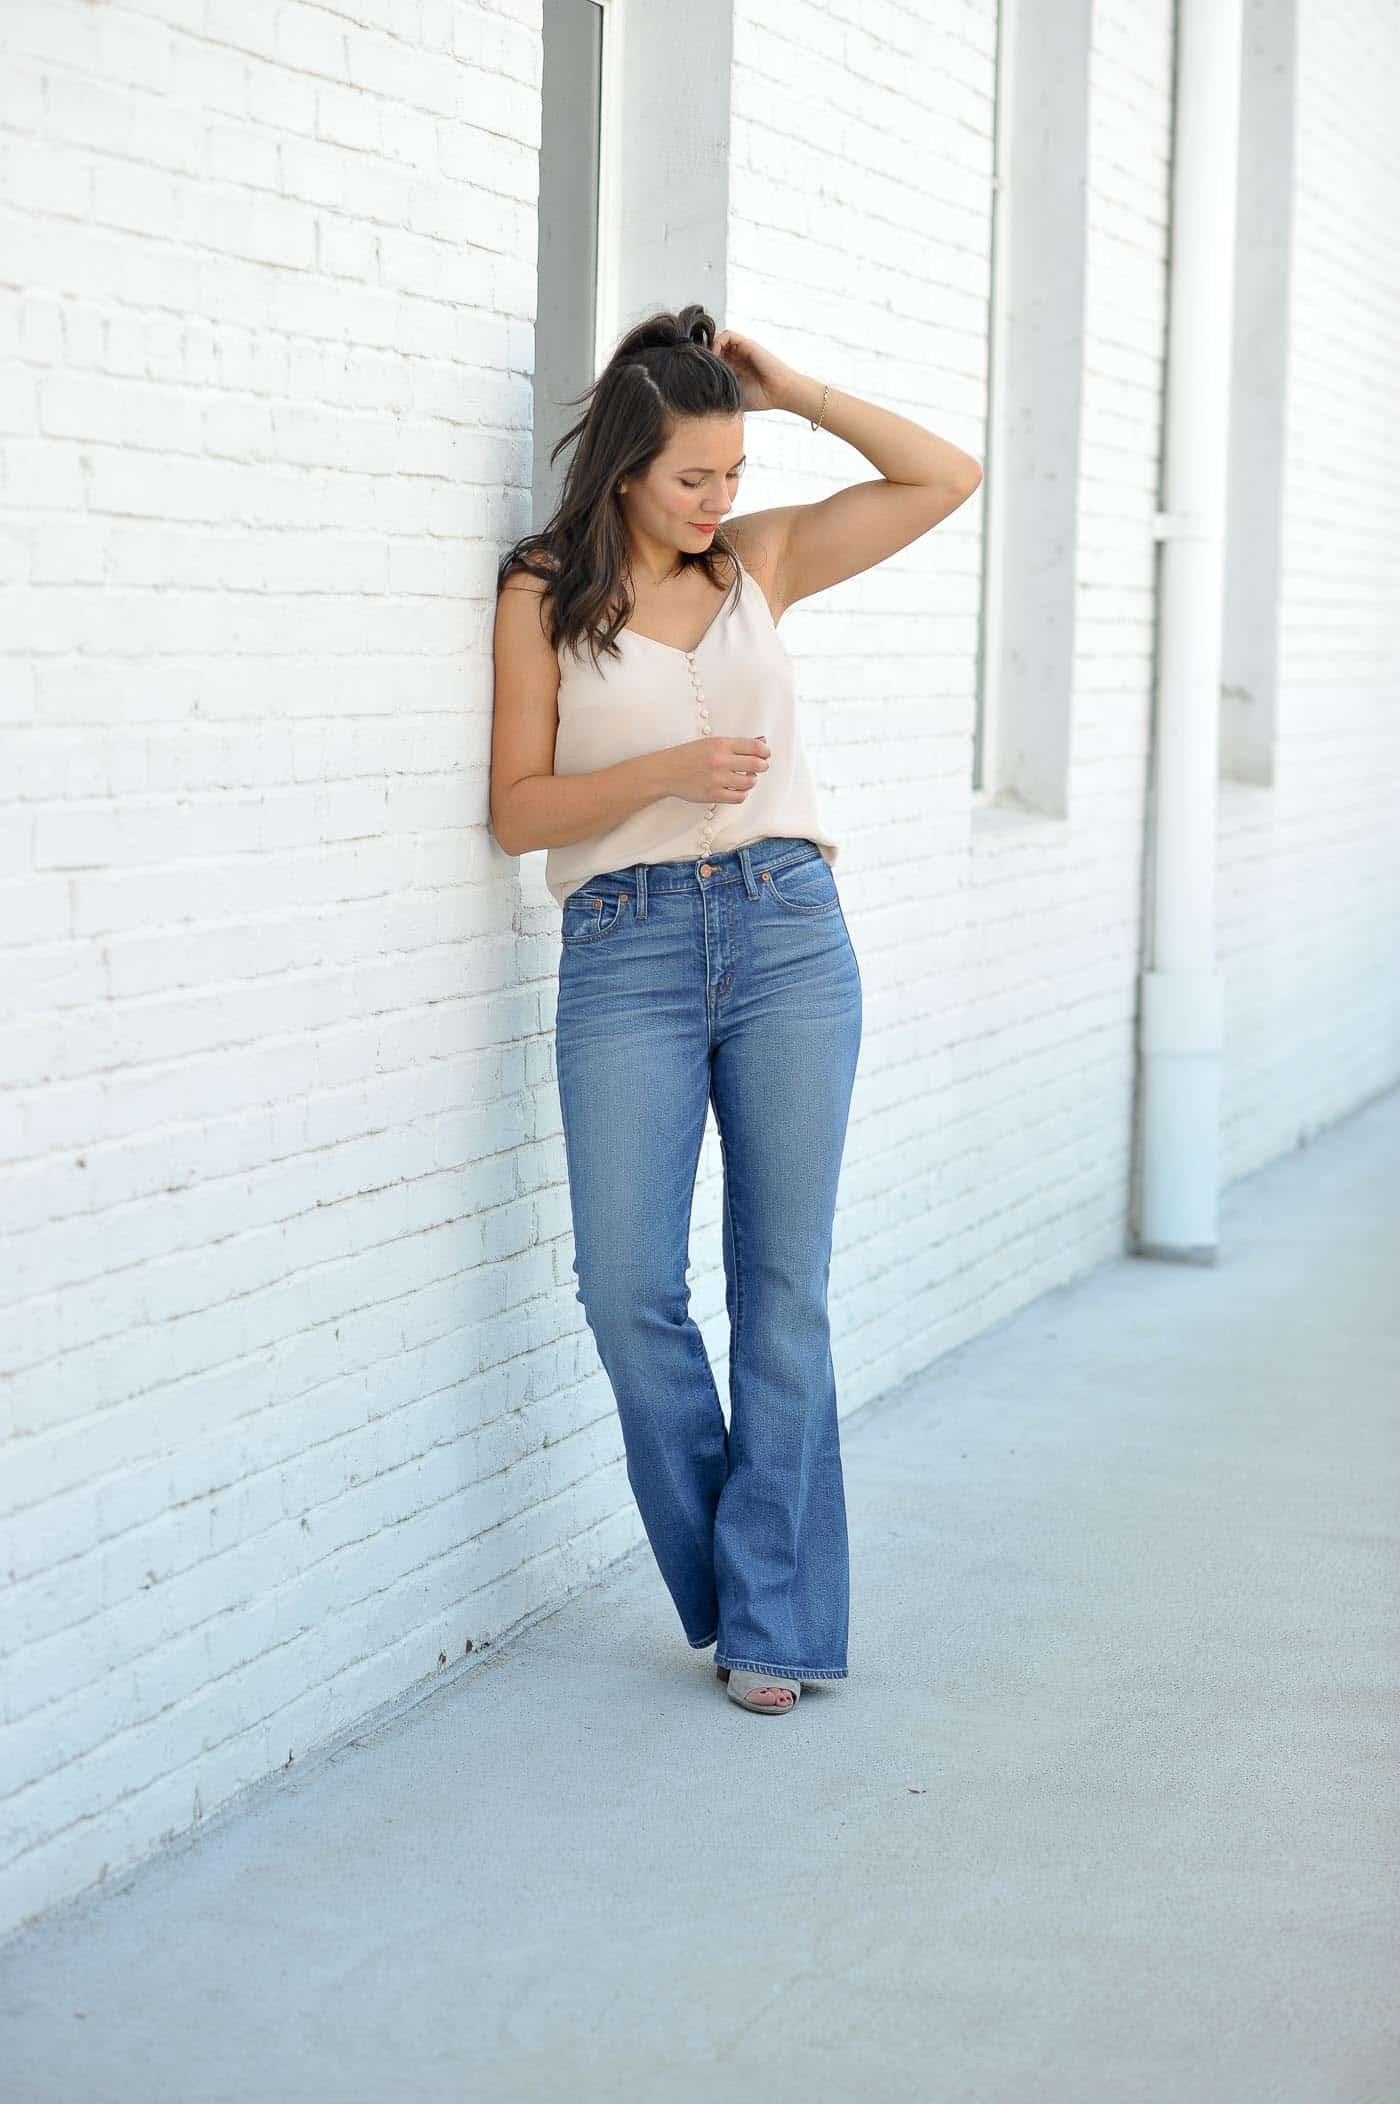 Millennial pink outfit idea, wide leg jeans - My Style Vita @mystylevita